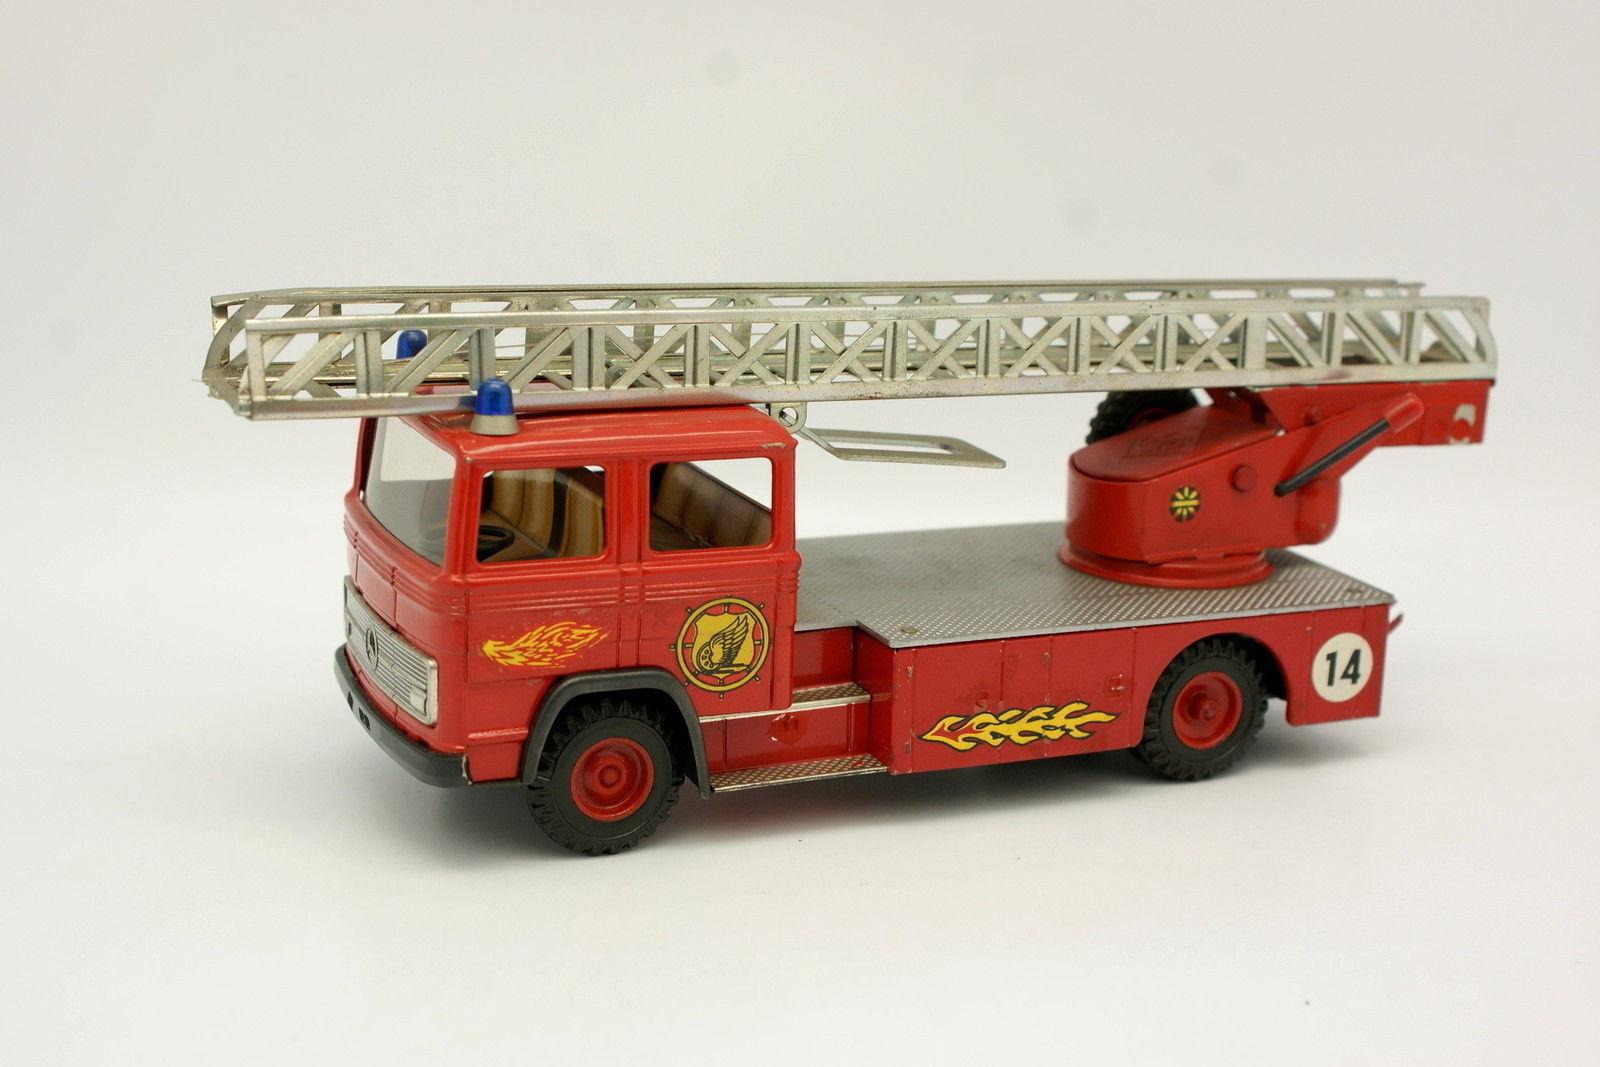 CKO DBGM Alemania 1 43 - Mercedes A A A escala Bomberos Feuerwehr  gran descuento